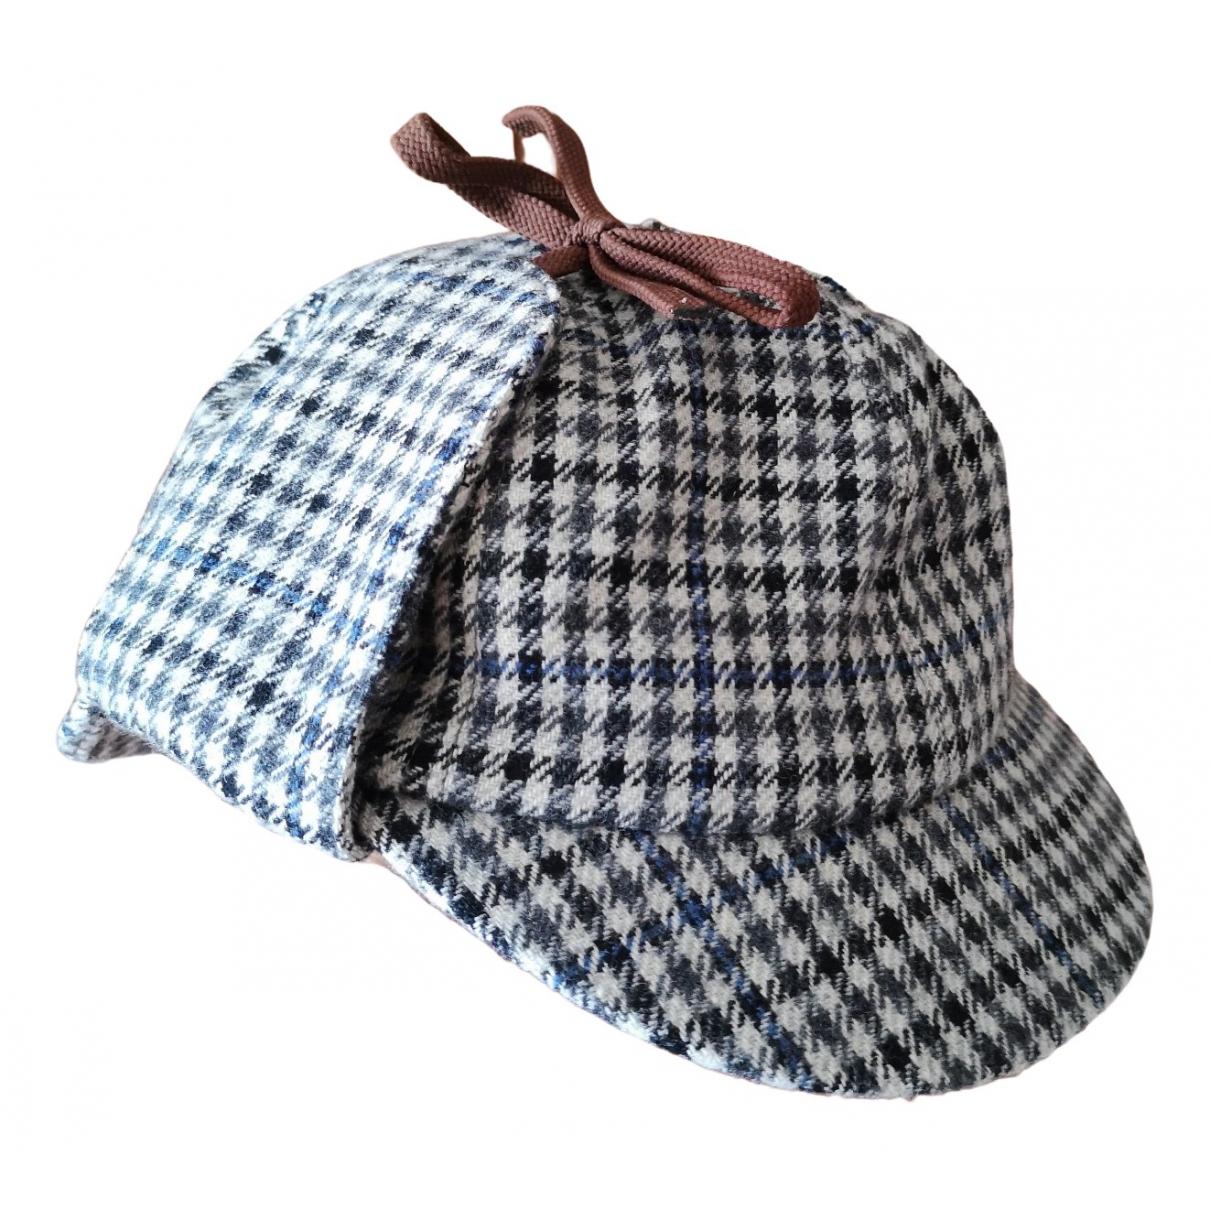 Burberry \N Wool hat for Women S International